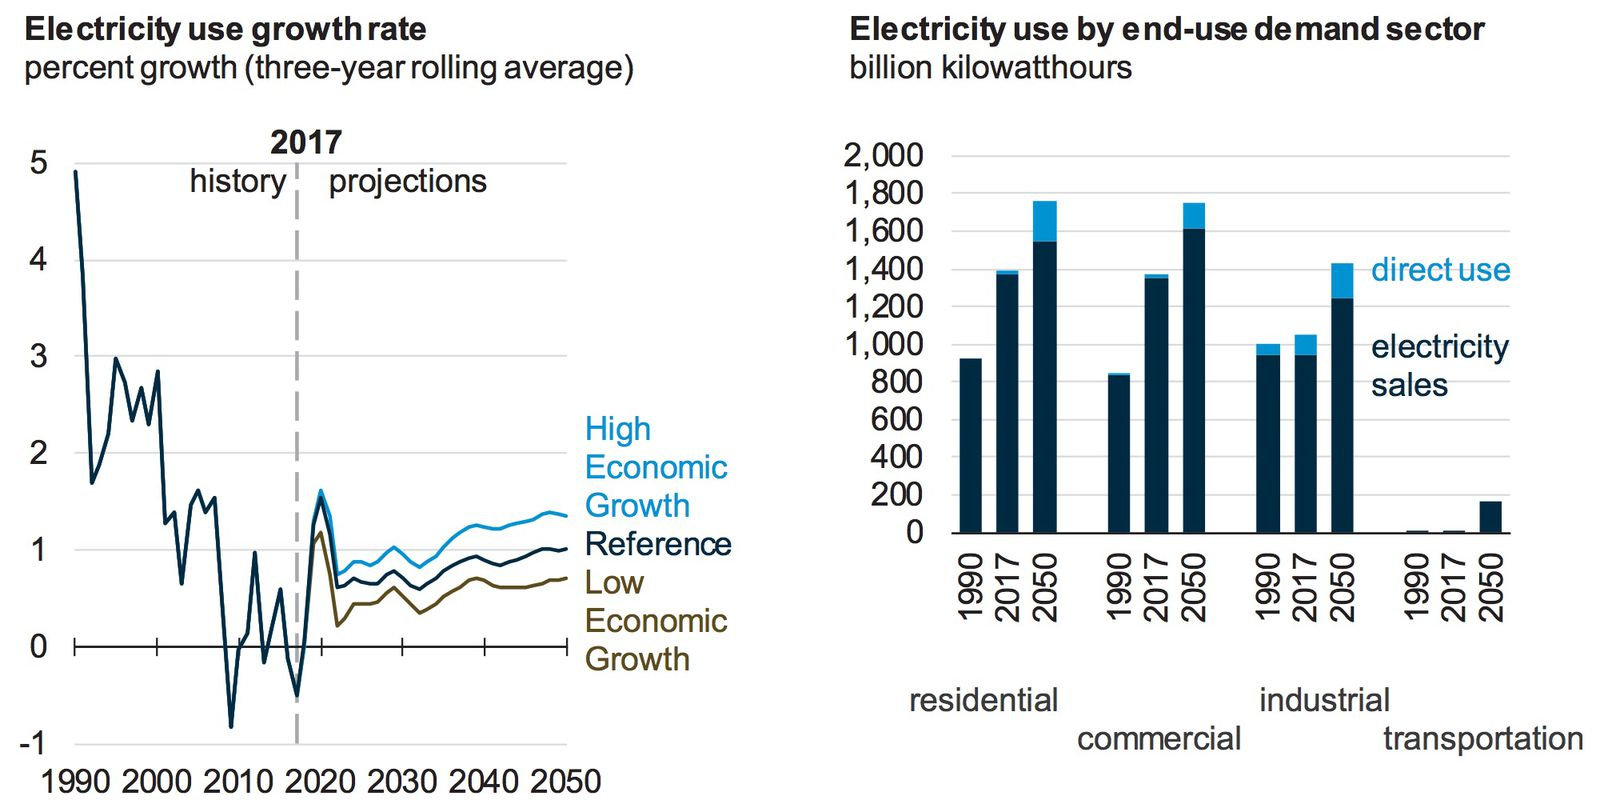 EIA electricity